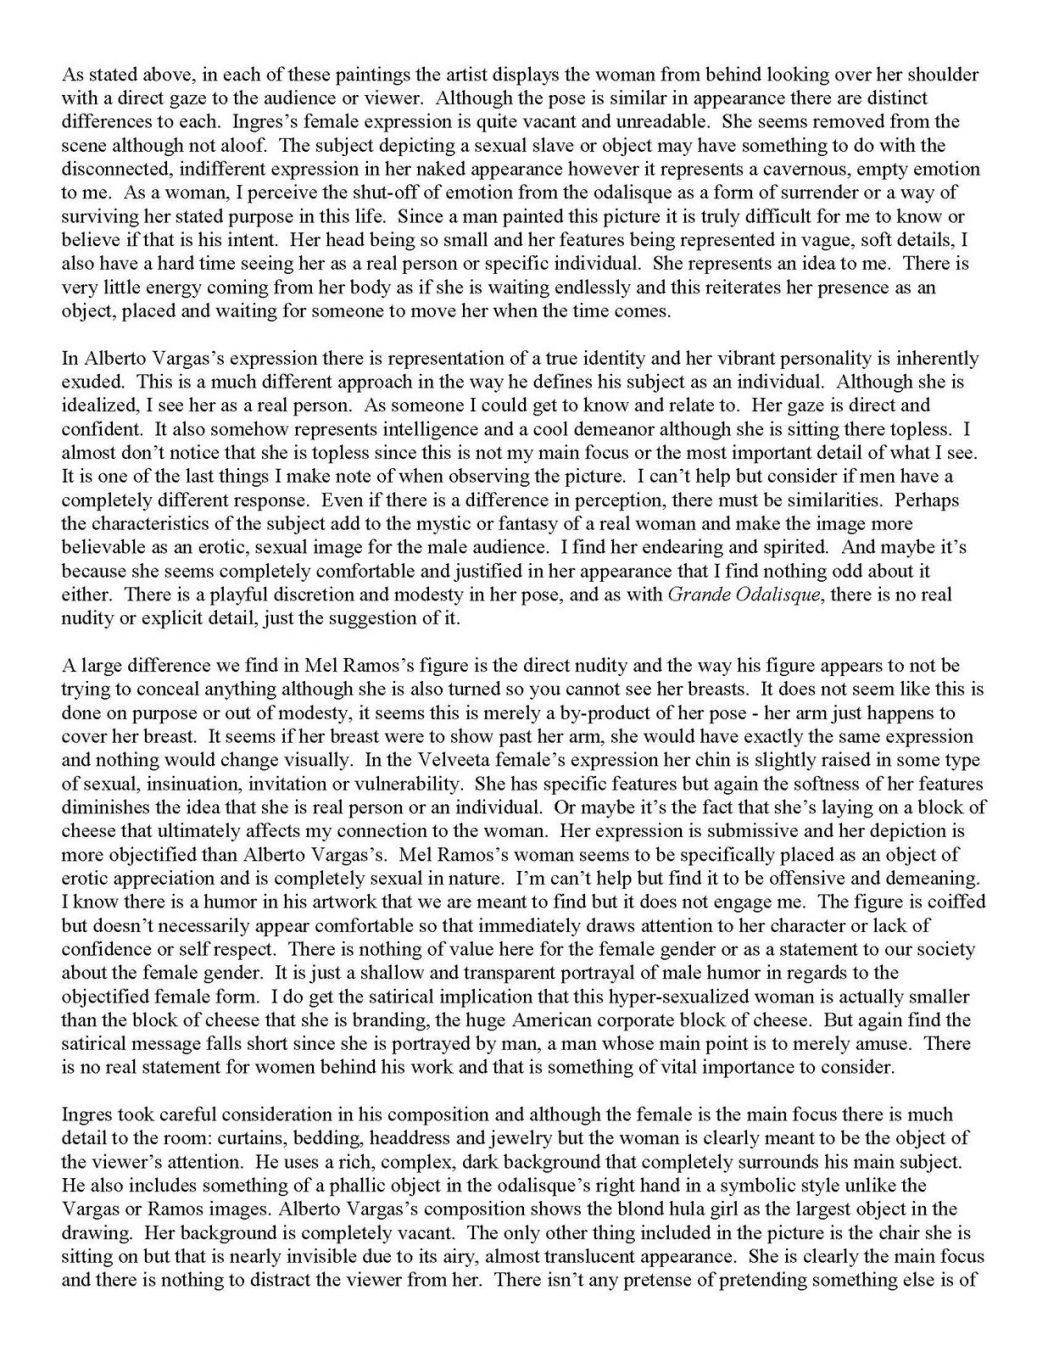 007 Essay Example Visual Examples Of Analysis Essays Outline Movie Visualanalysisfinaldraft P Image Sample Rhetorical Text Advertisement Argument Shocking Response Literacy Arts Full